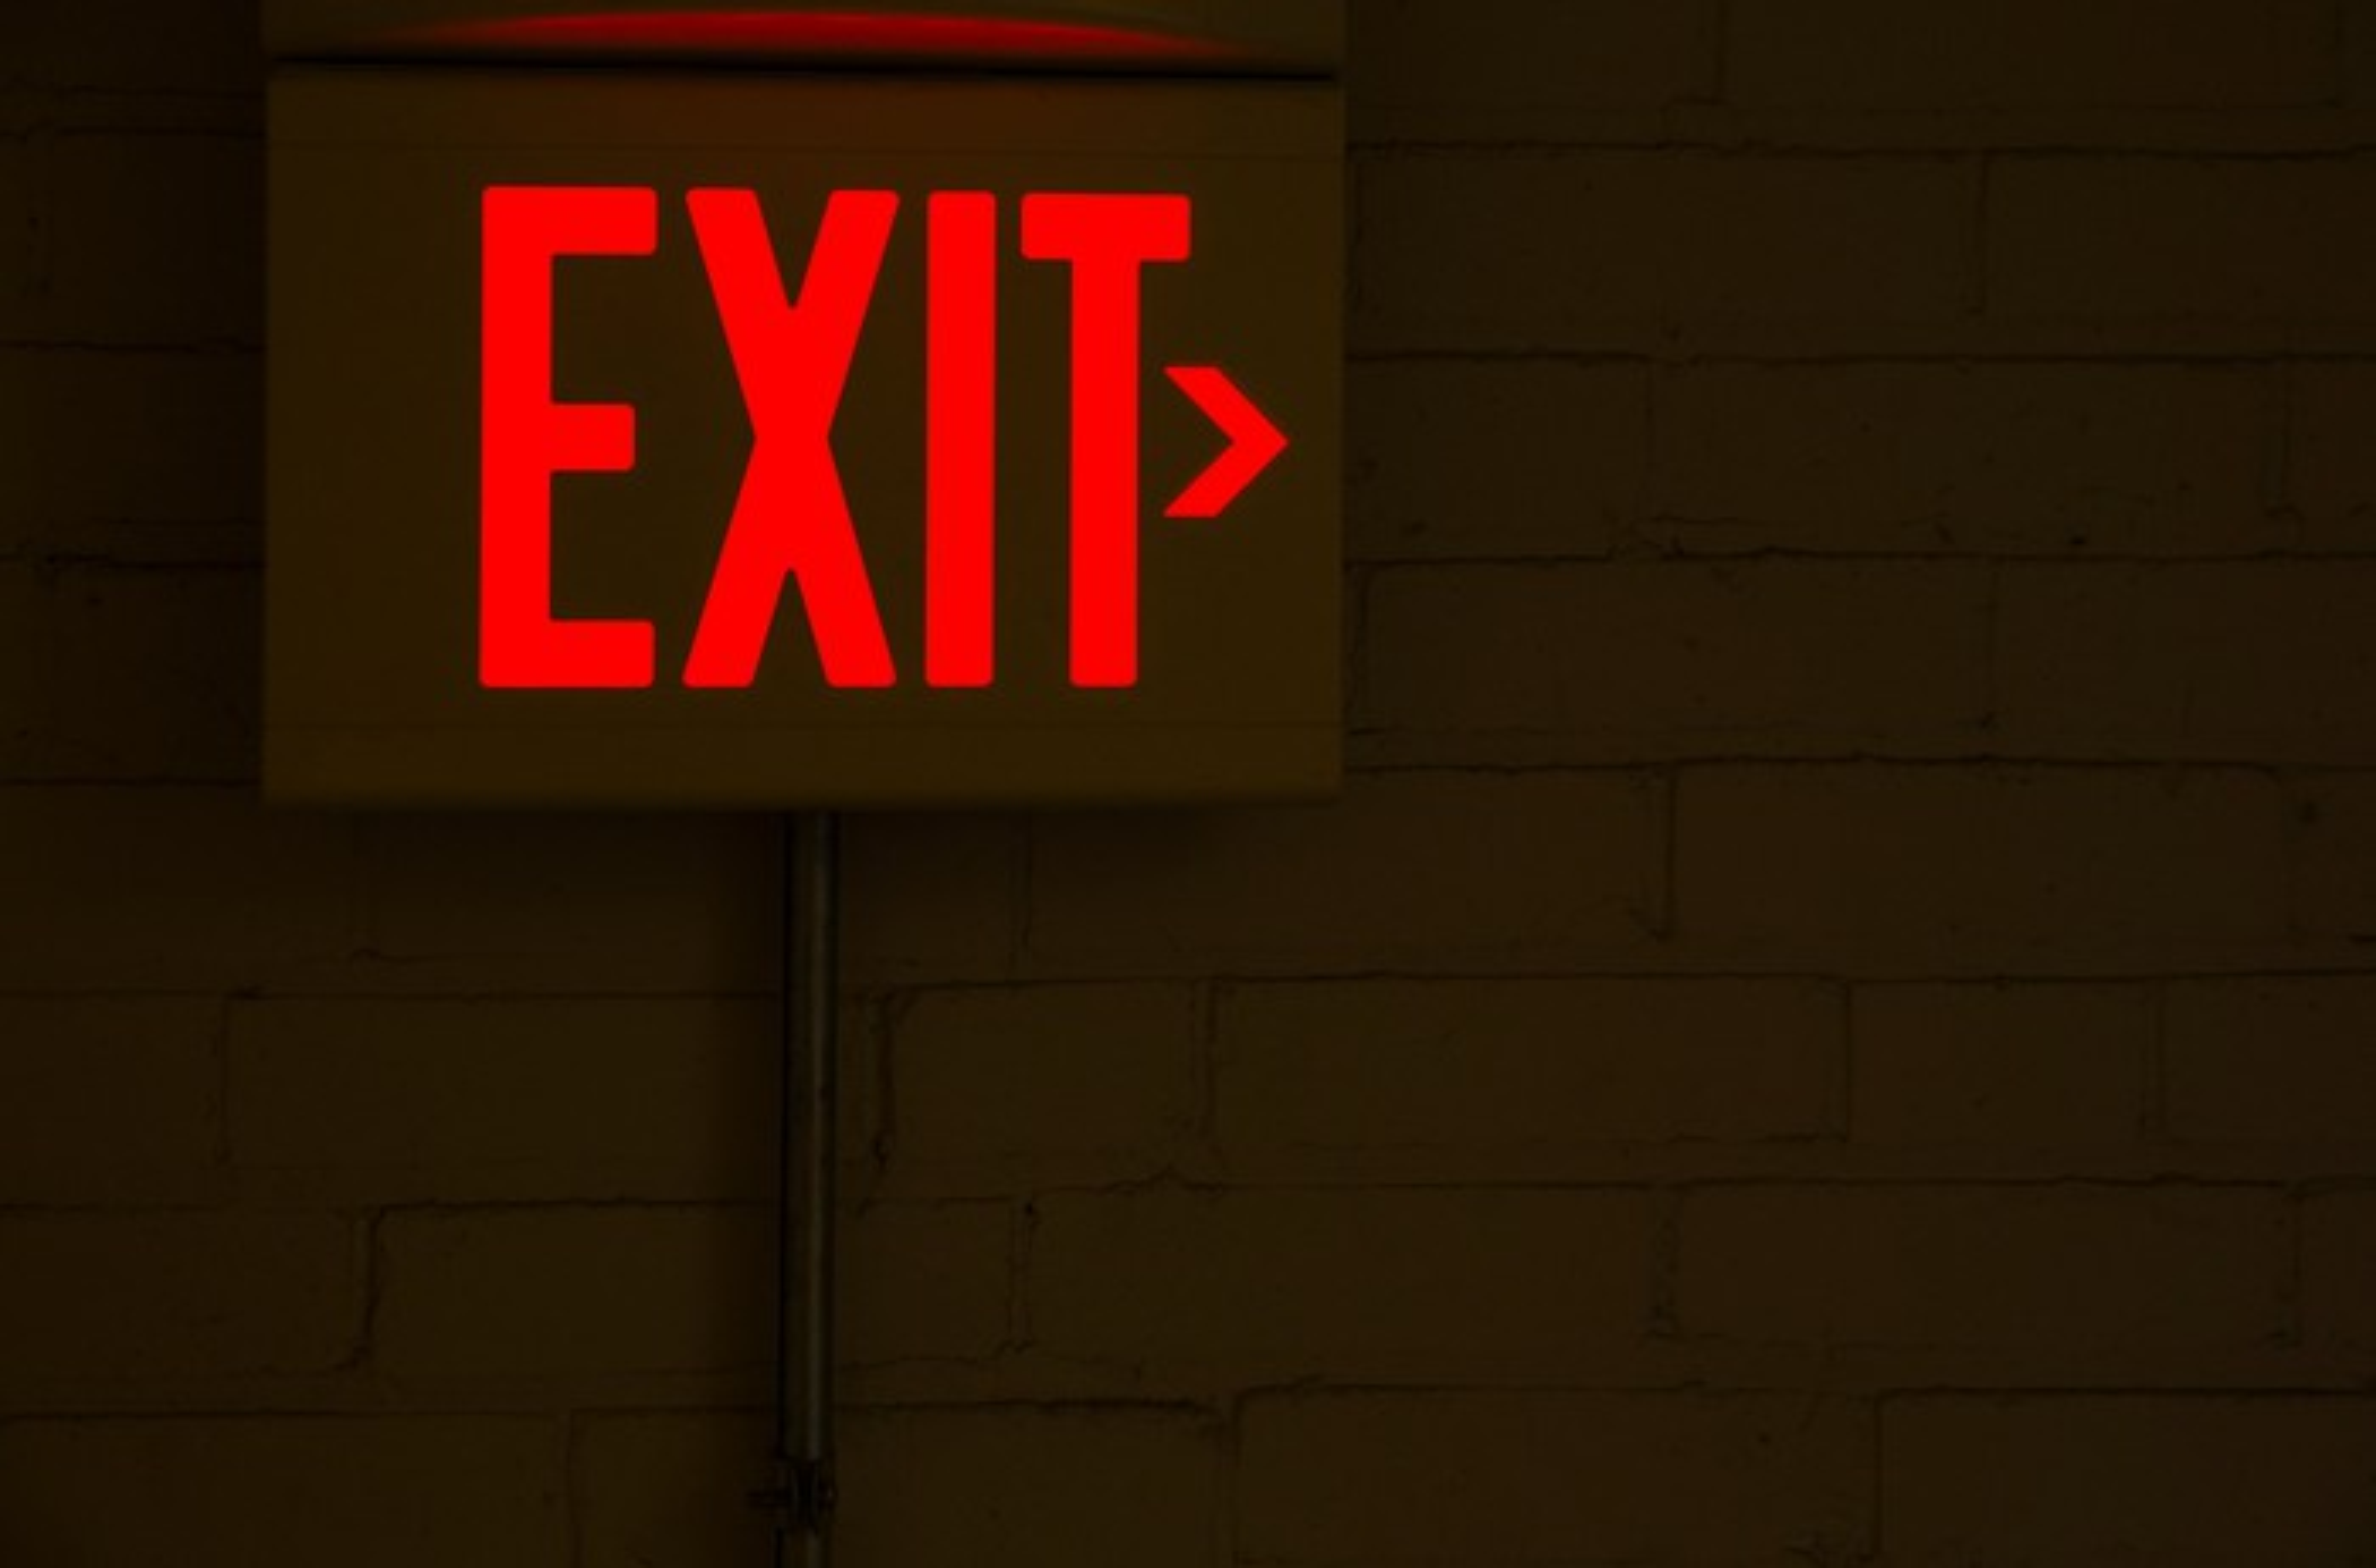 Neon exit sign in a dark room.